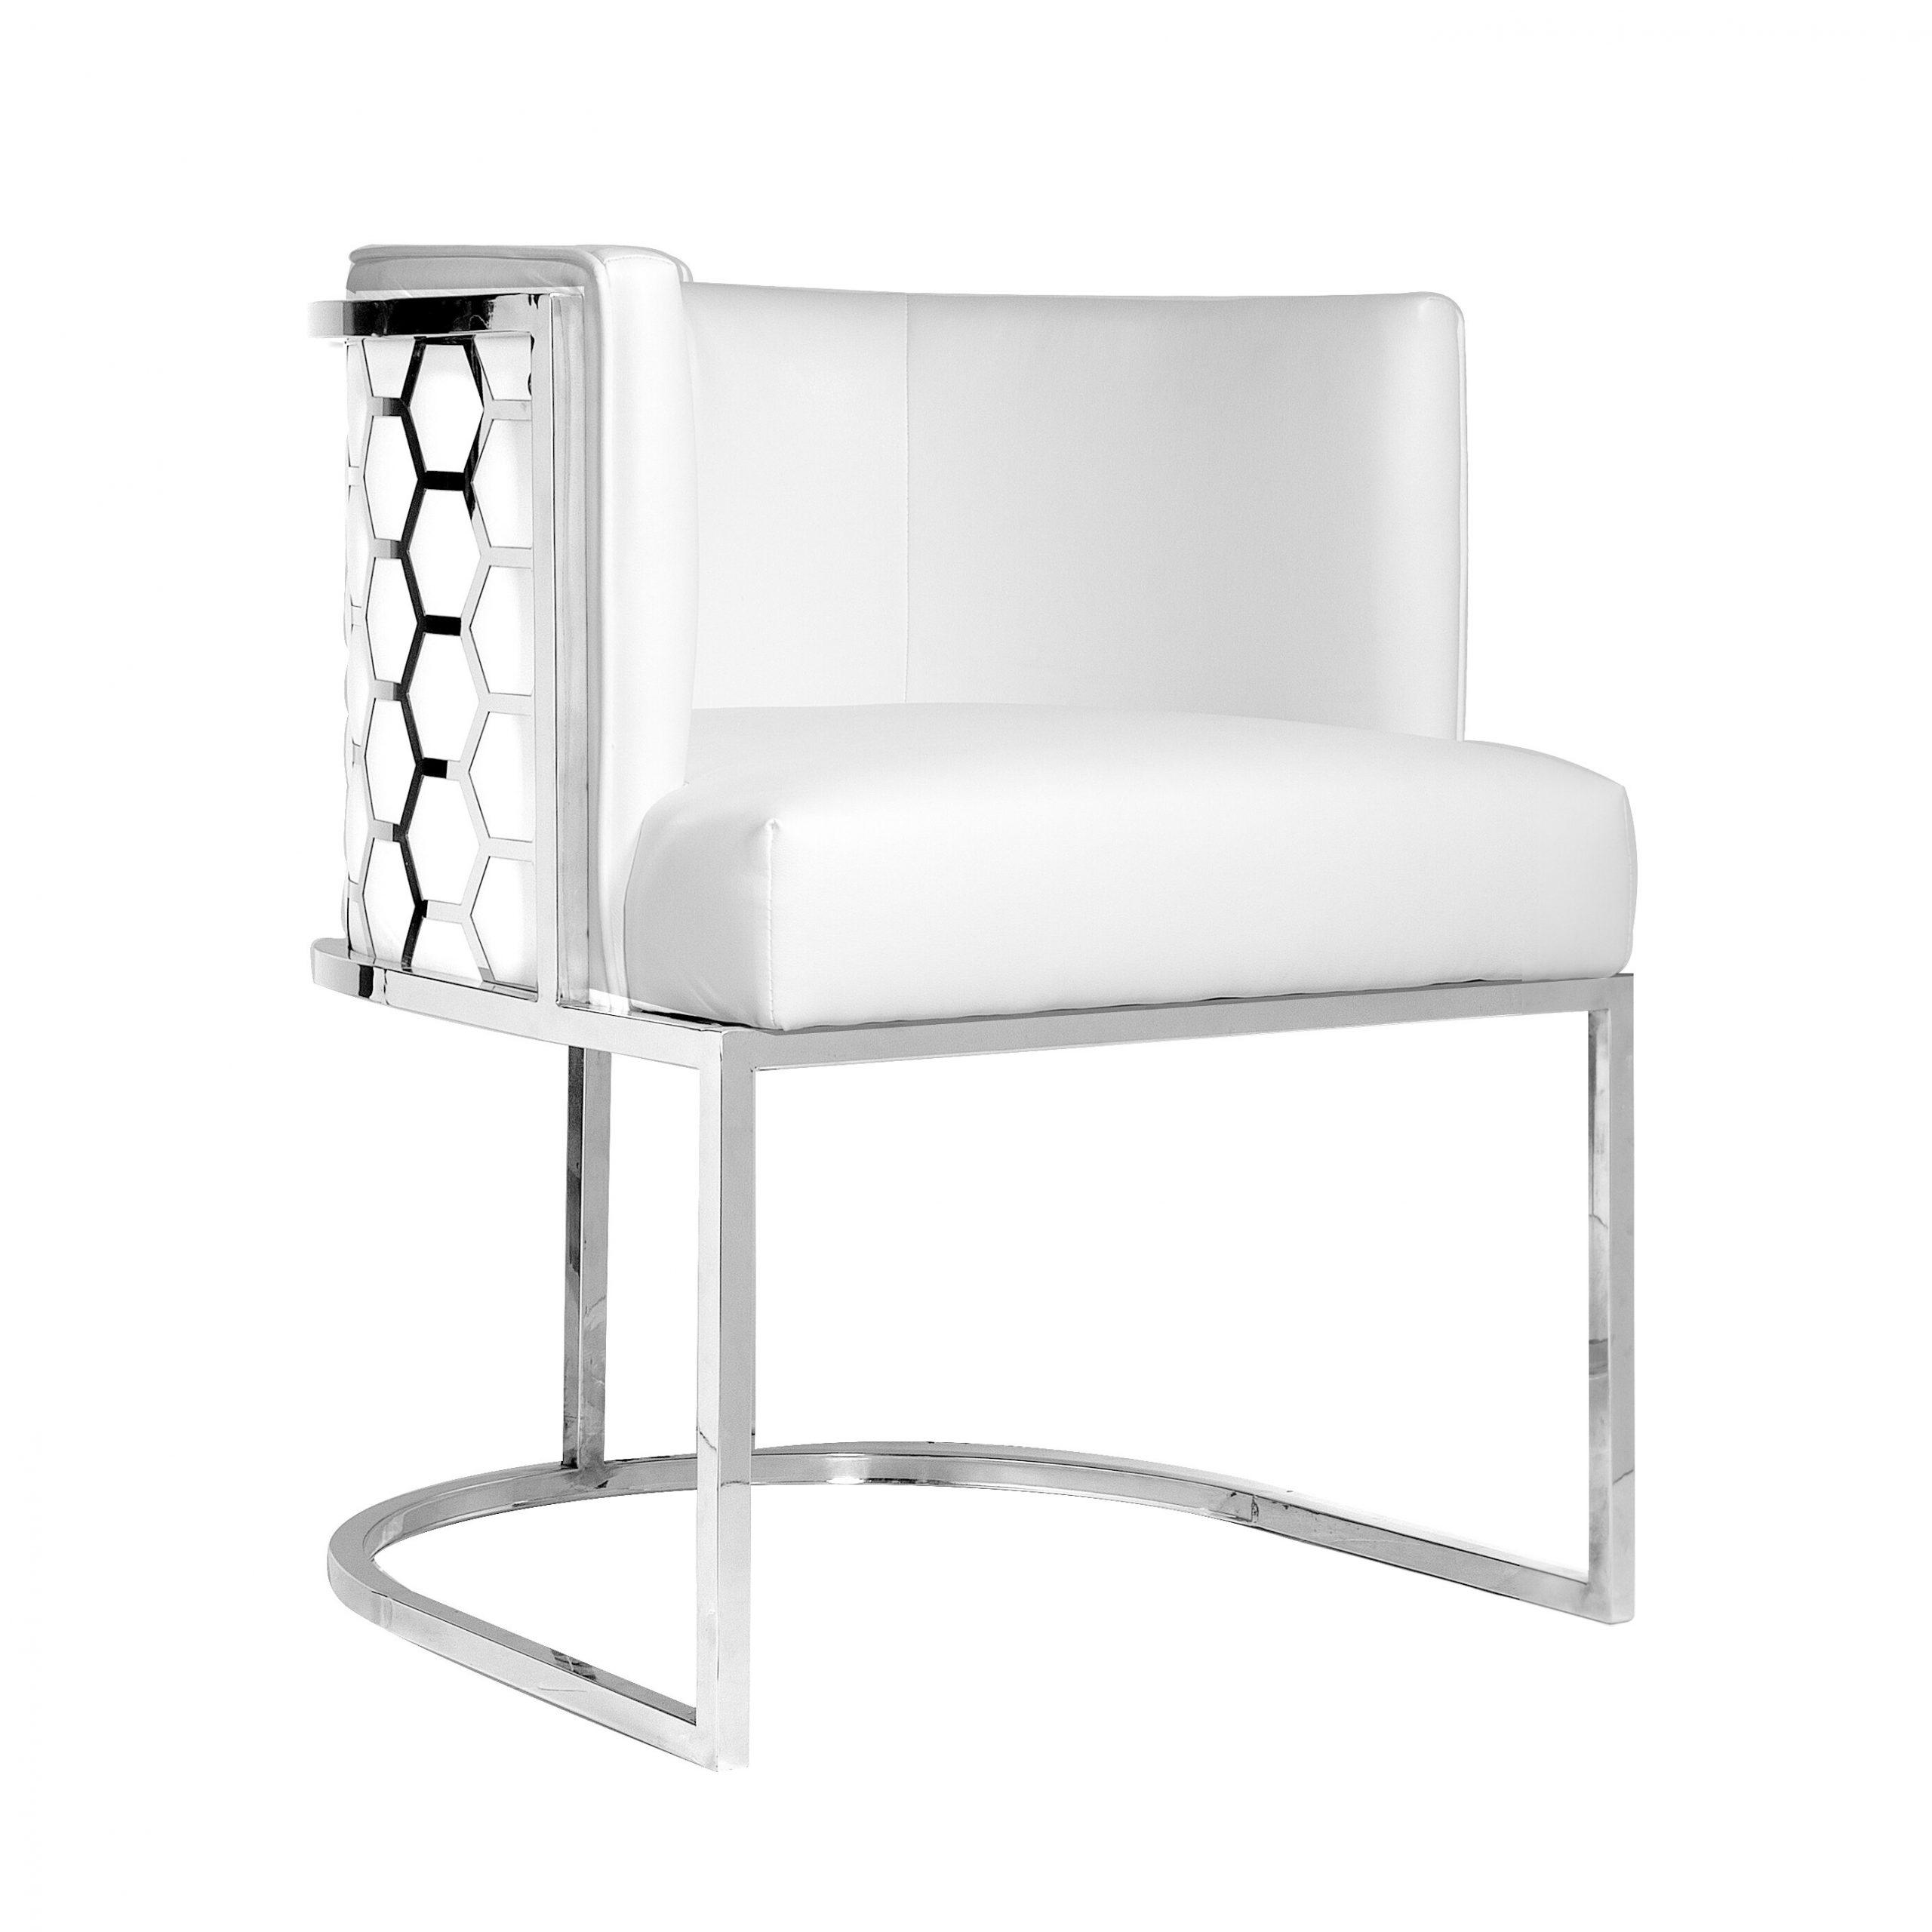 "Quevedo 23"" W Faux Leather Barrel Chair Regarding Navin Barrel Chairs (View 14 of 15)"